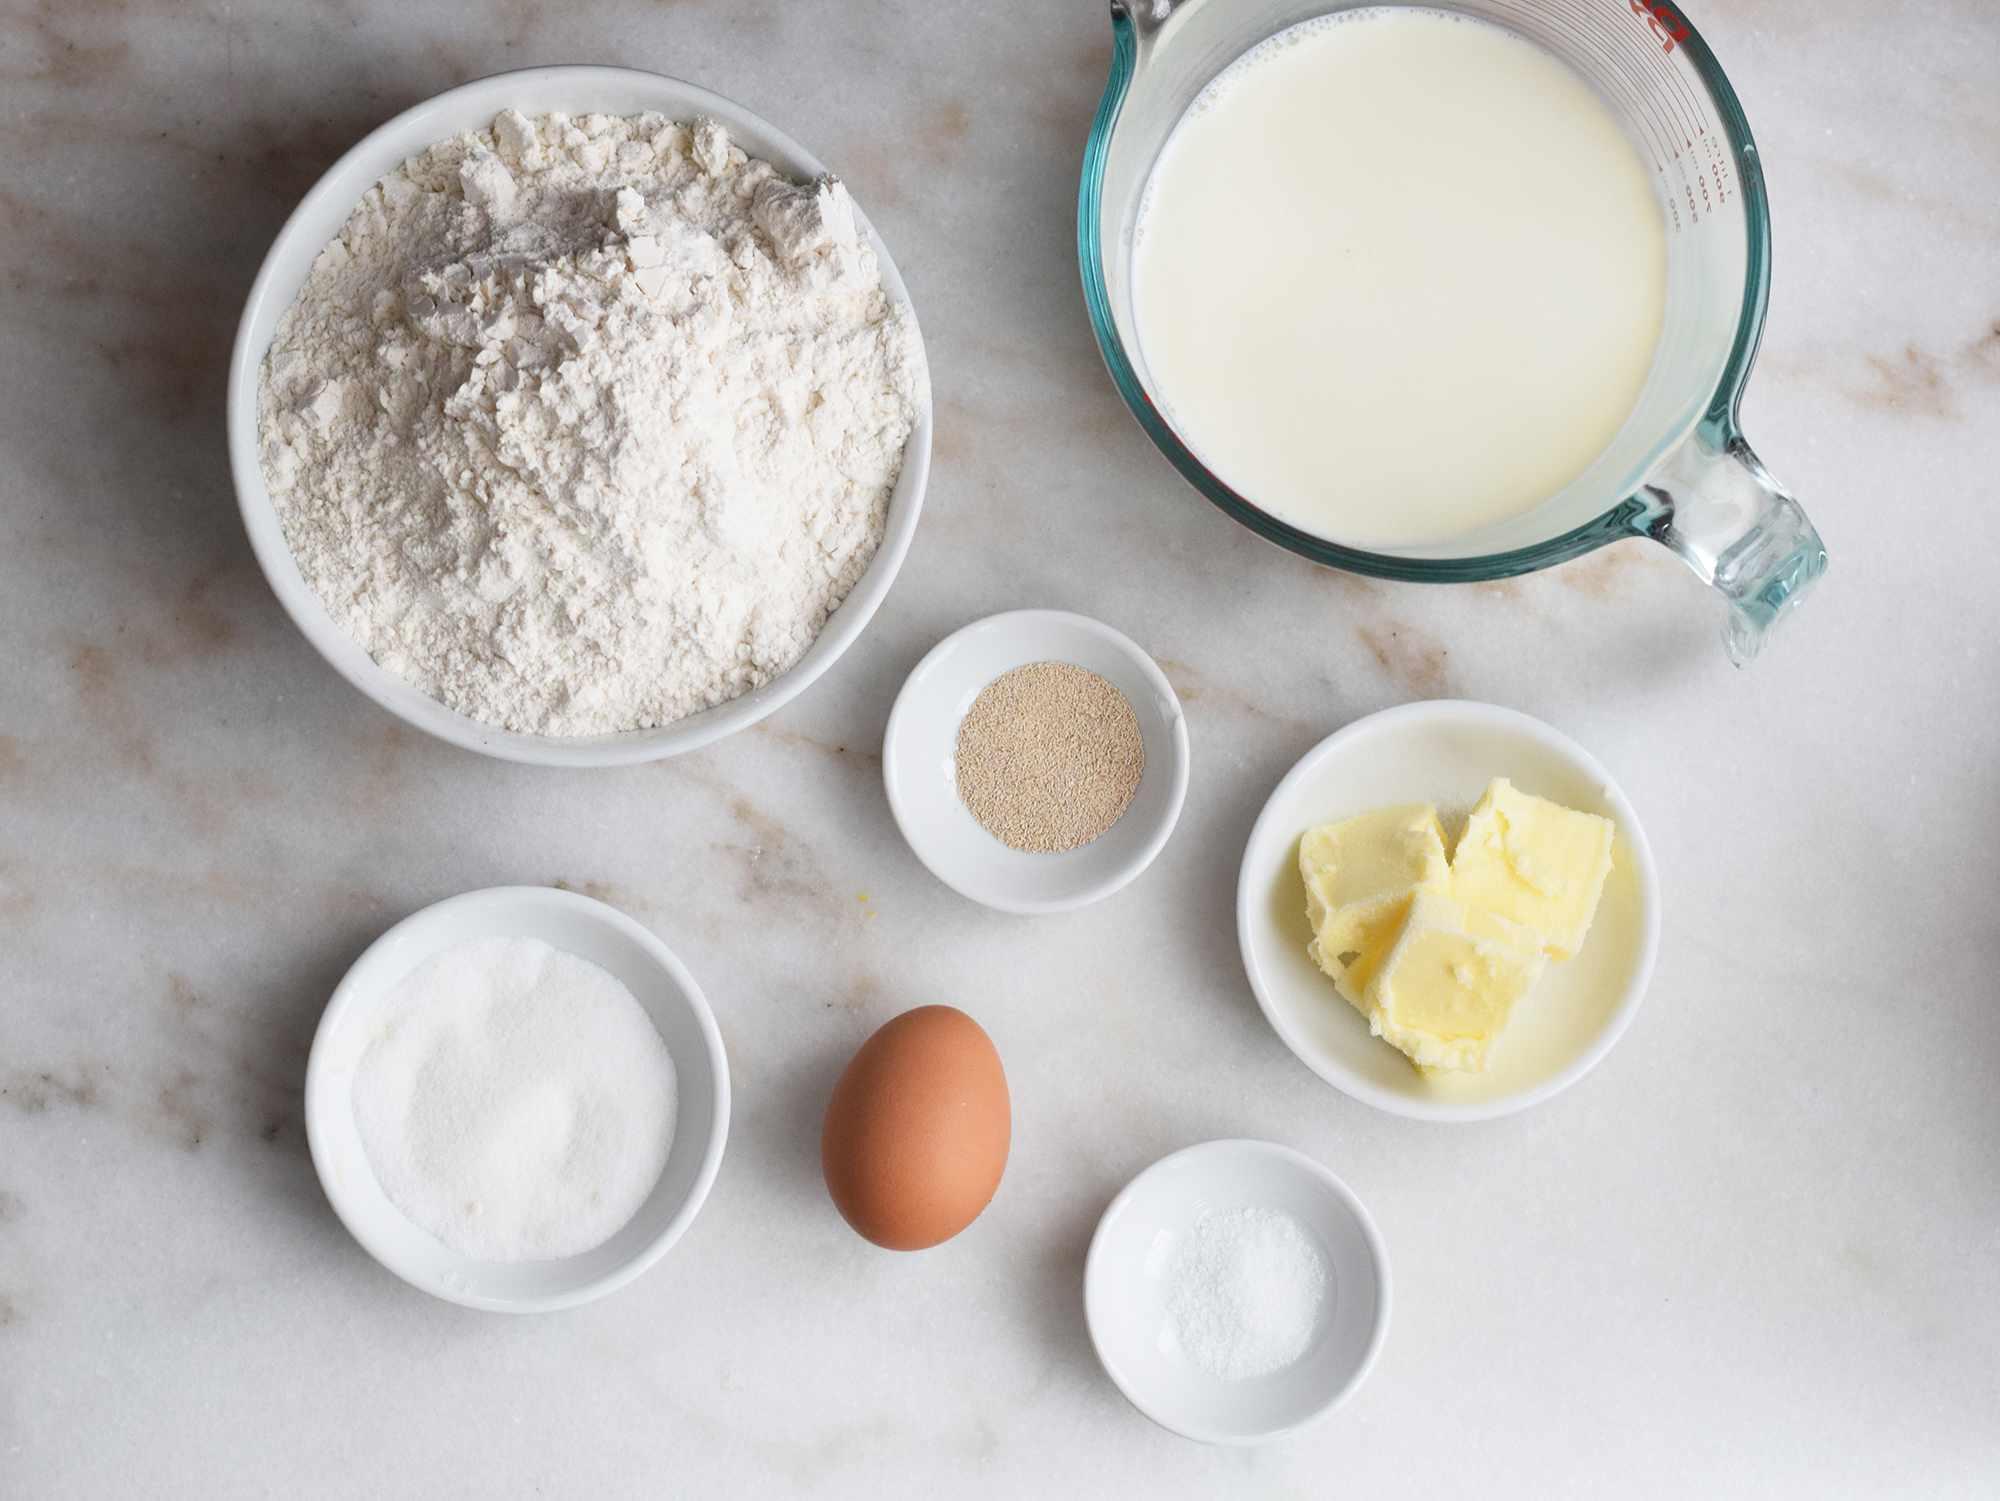 ingredients for bierock